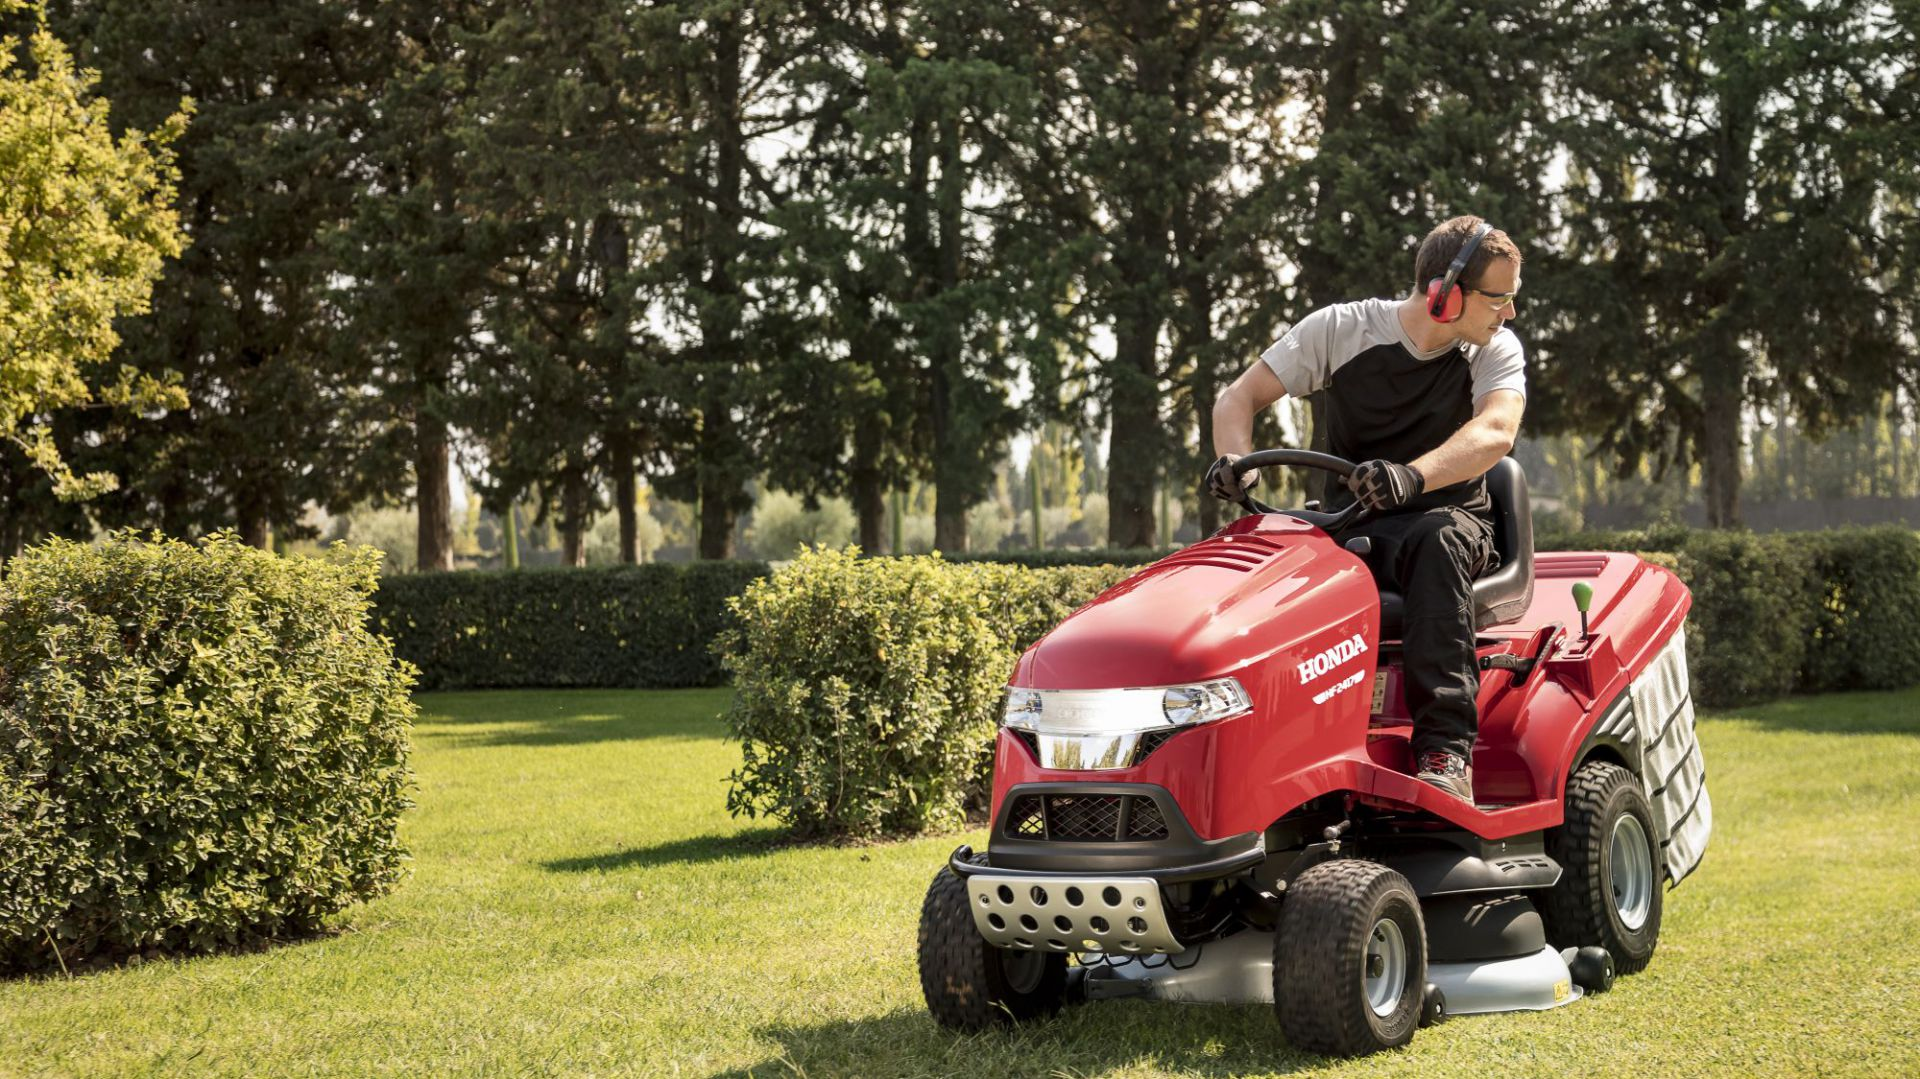 Piękny ogród - mulczowanie trawy: Honda HF2417. Fot. Honda